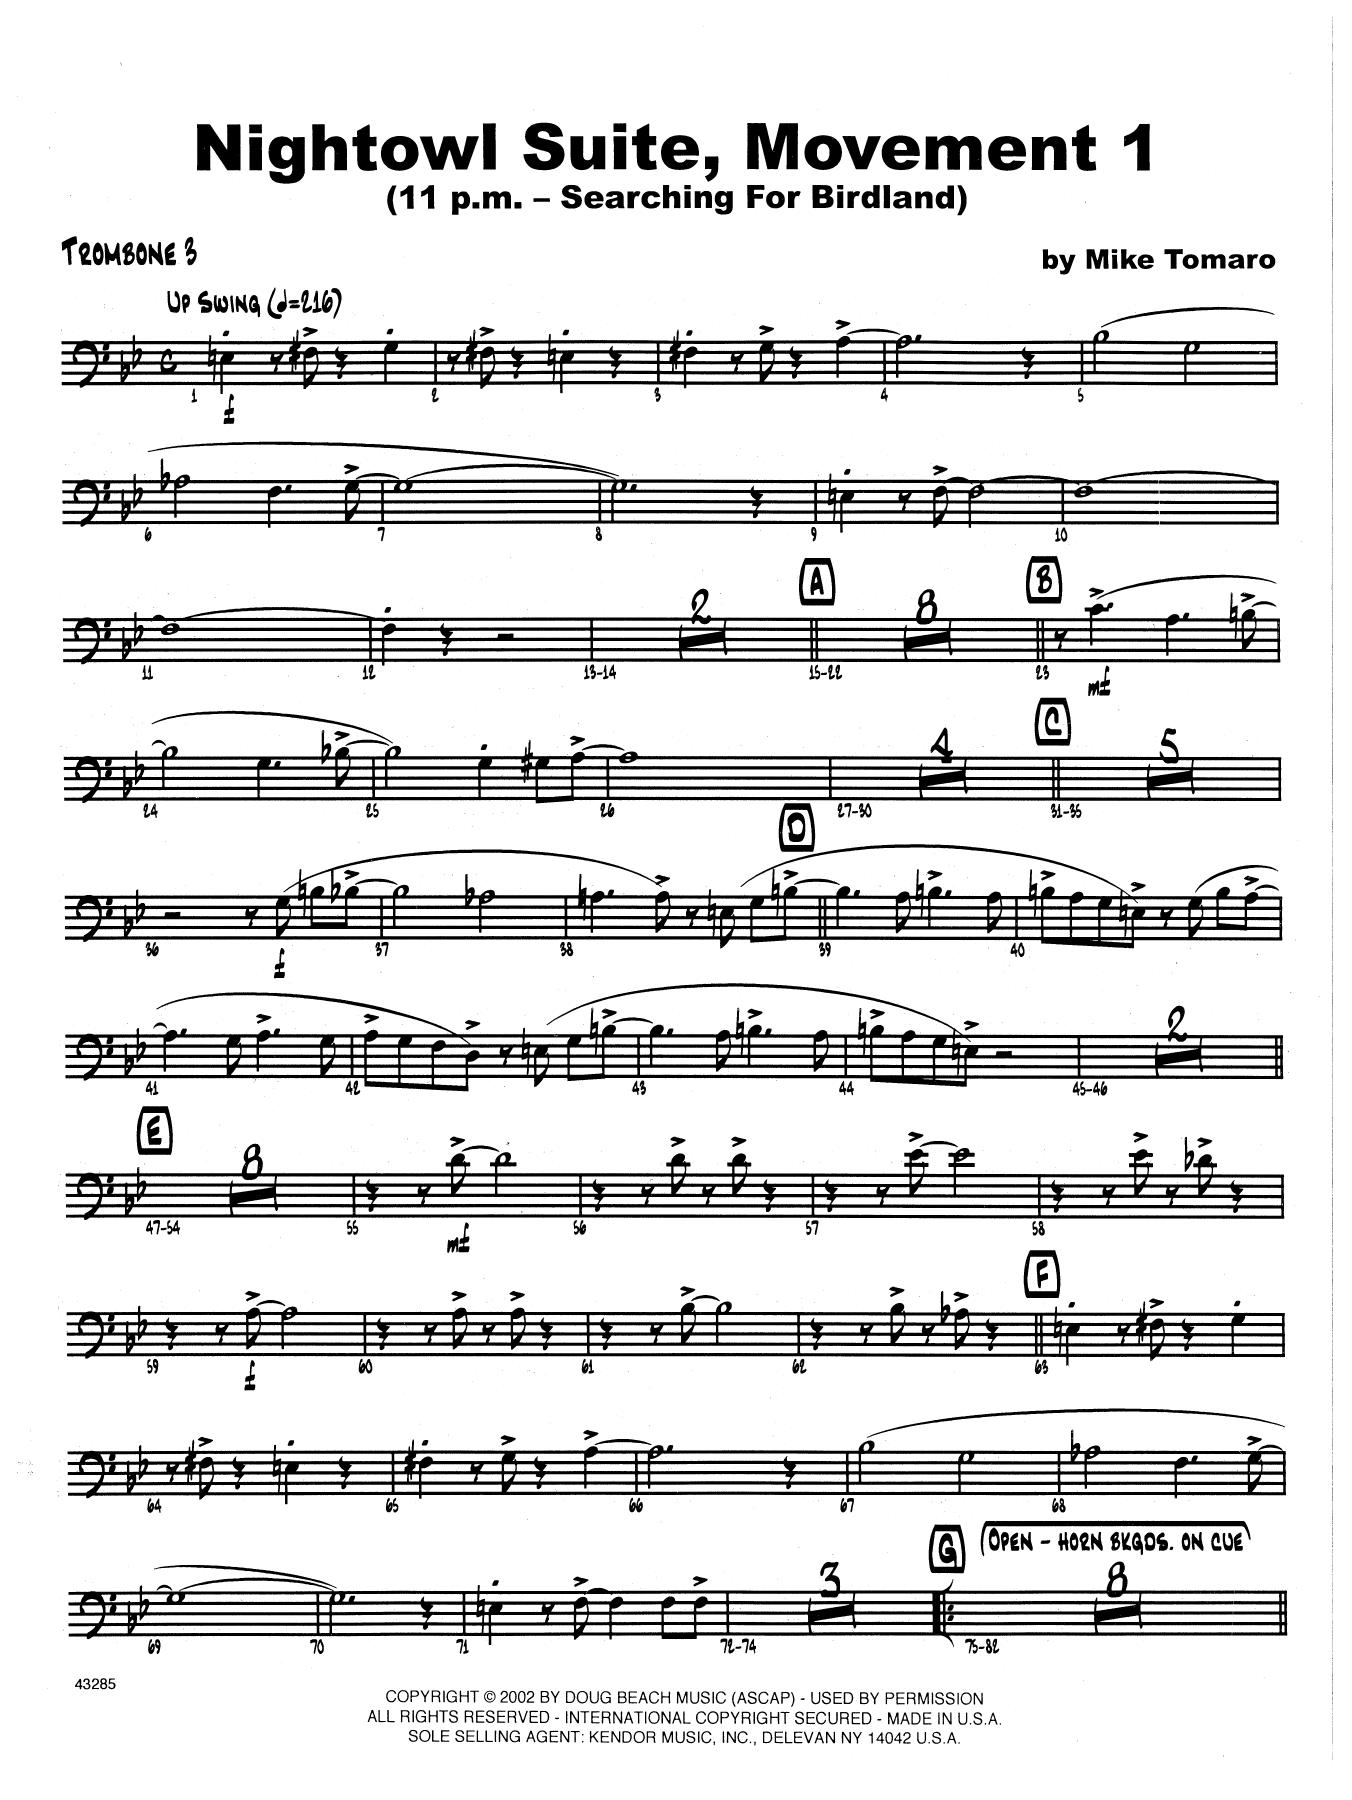 Nightowl Suite, Mvt. 1 - 3rd Trombone